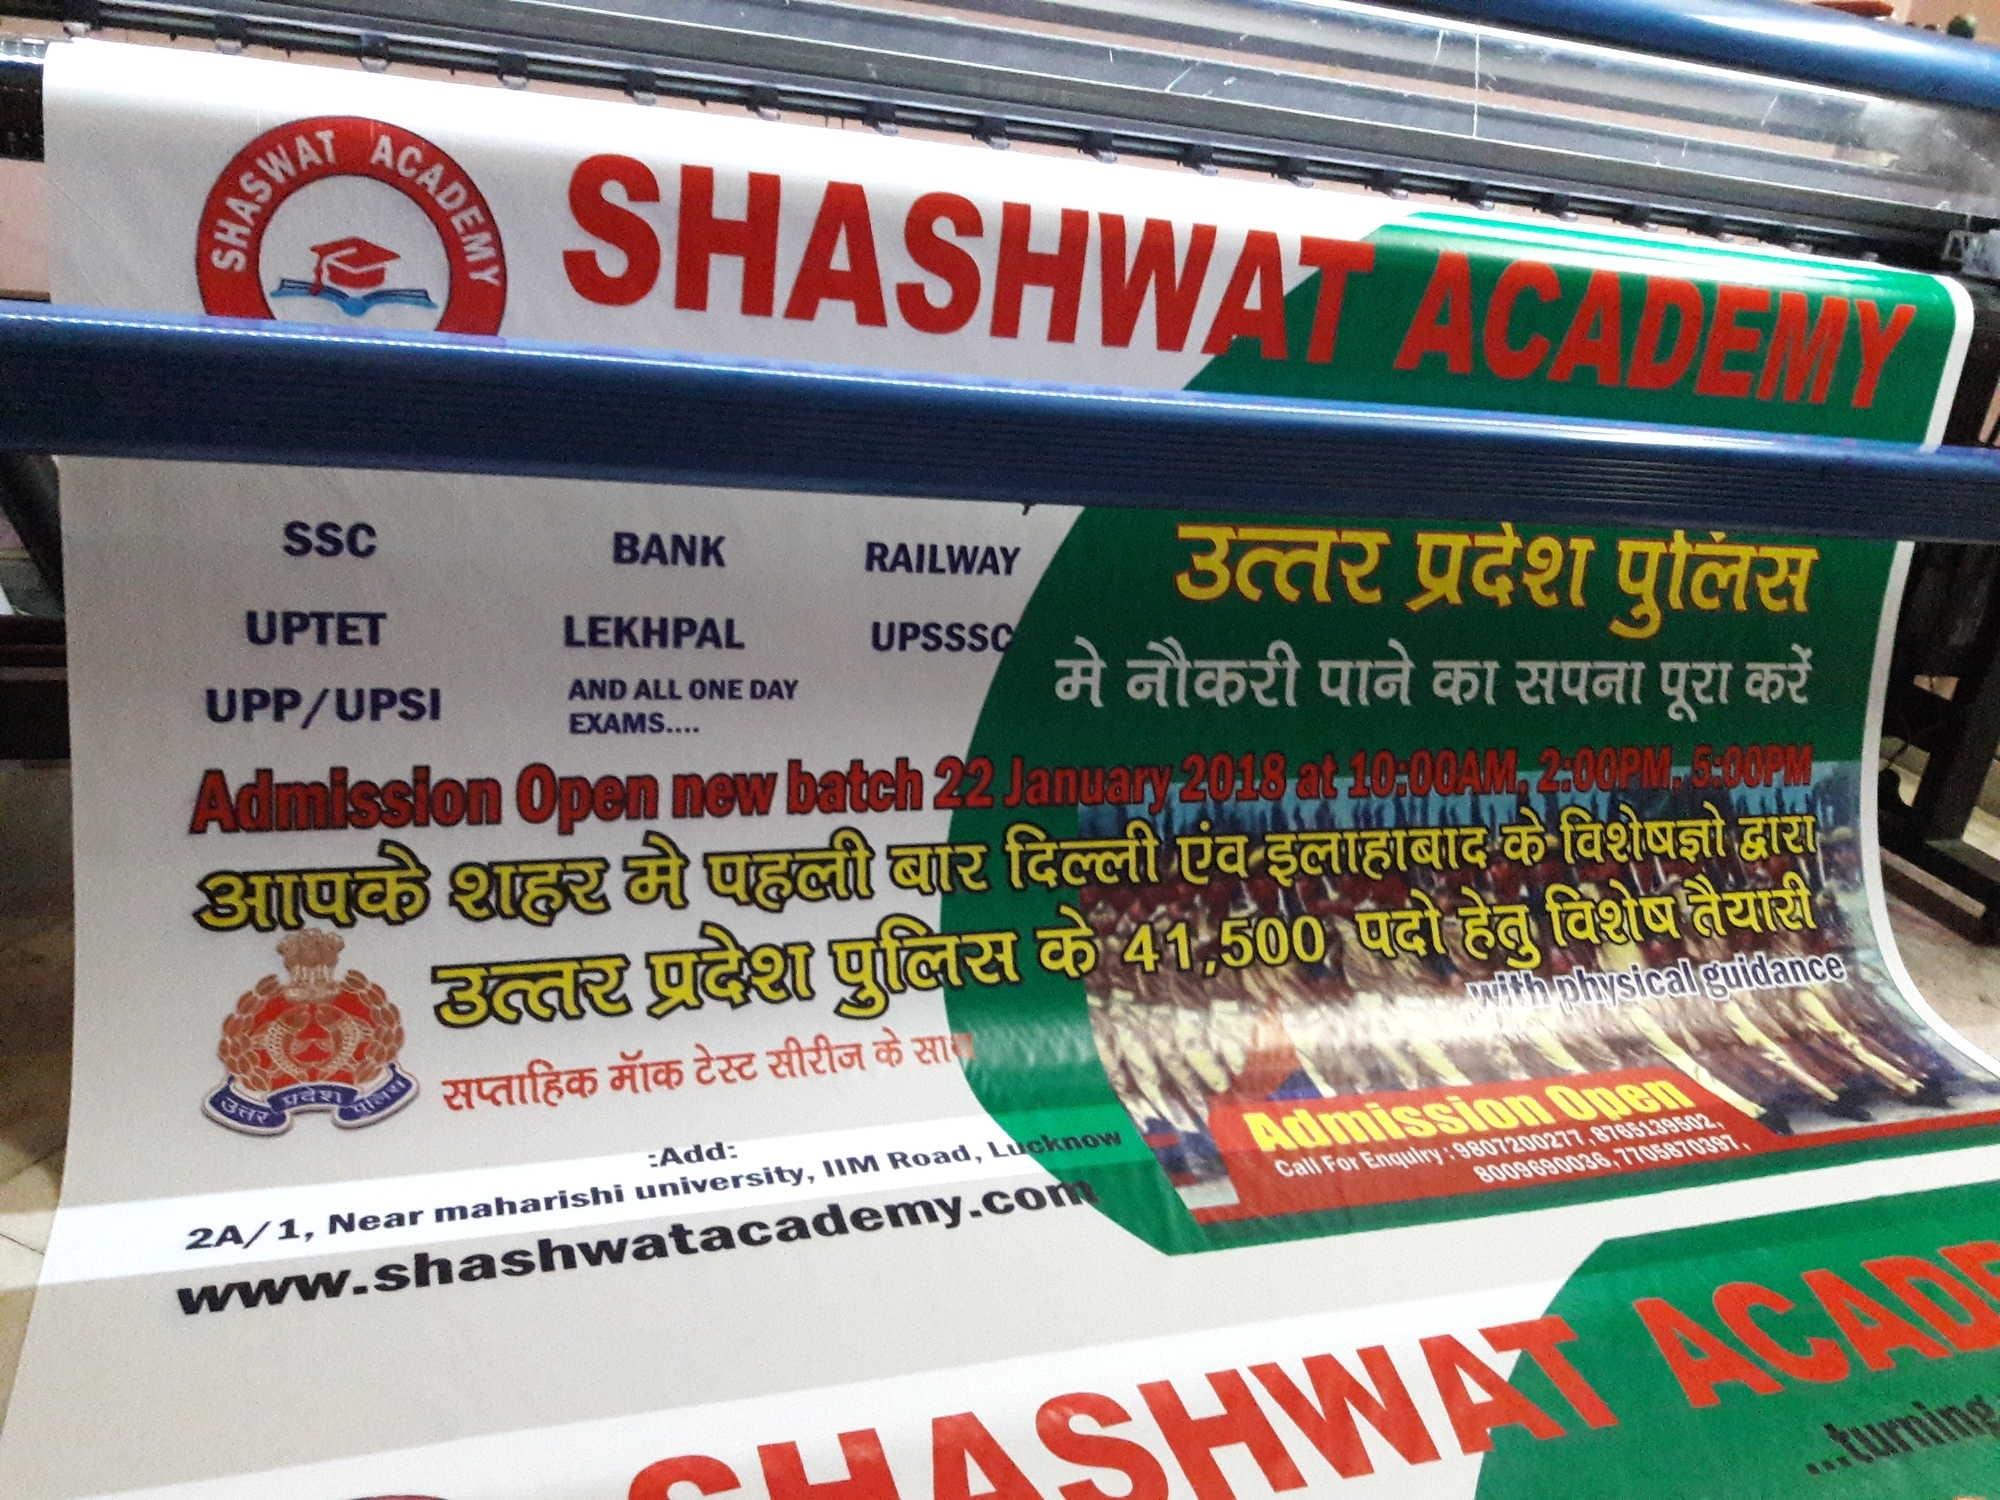 Shri Radha Govind Flex Printing, Fazullaganj - Flex Printing Calendar Printing In Lucknow